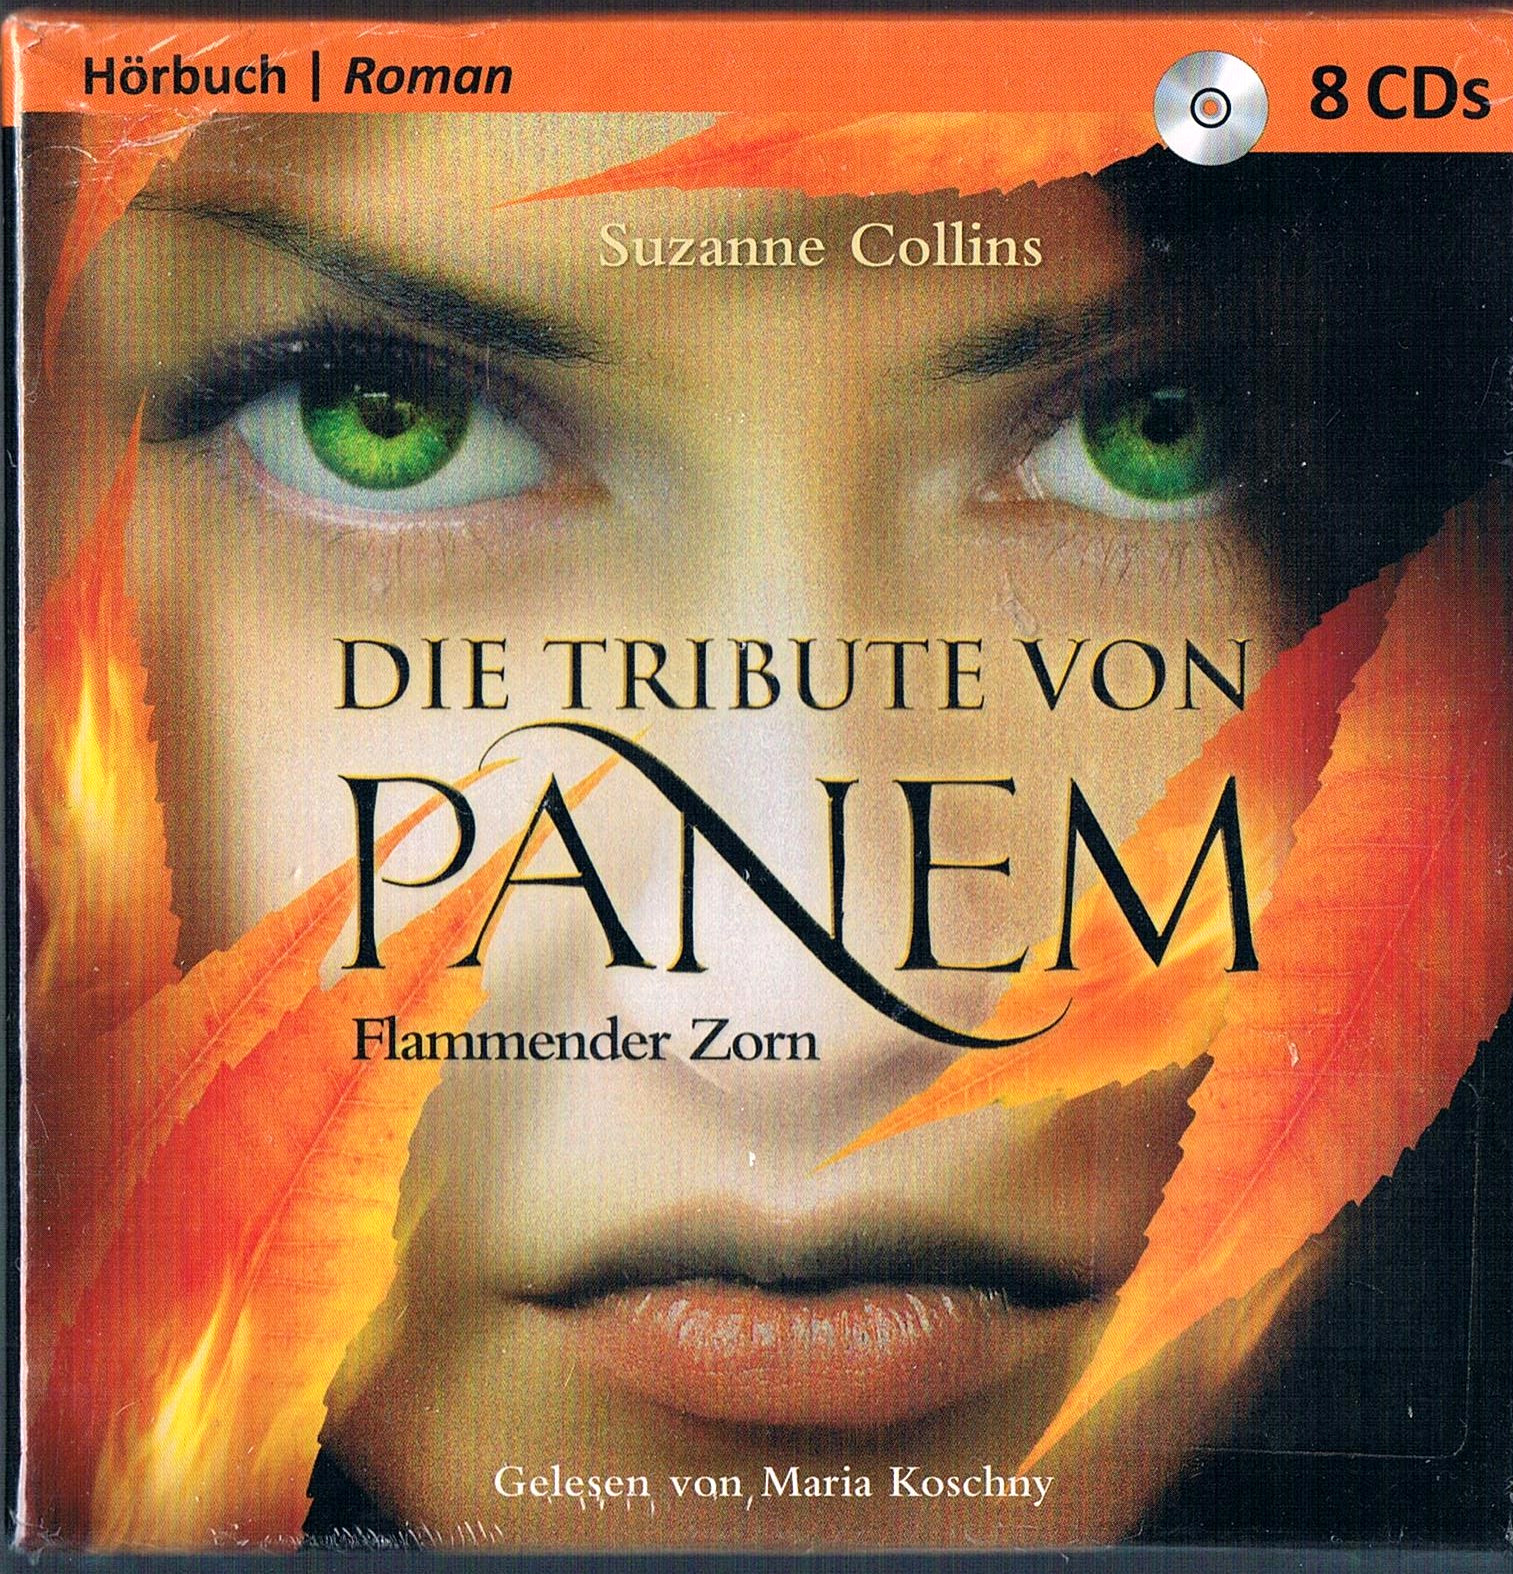 Tribute von Panem Flammender Zorn CD